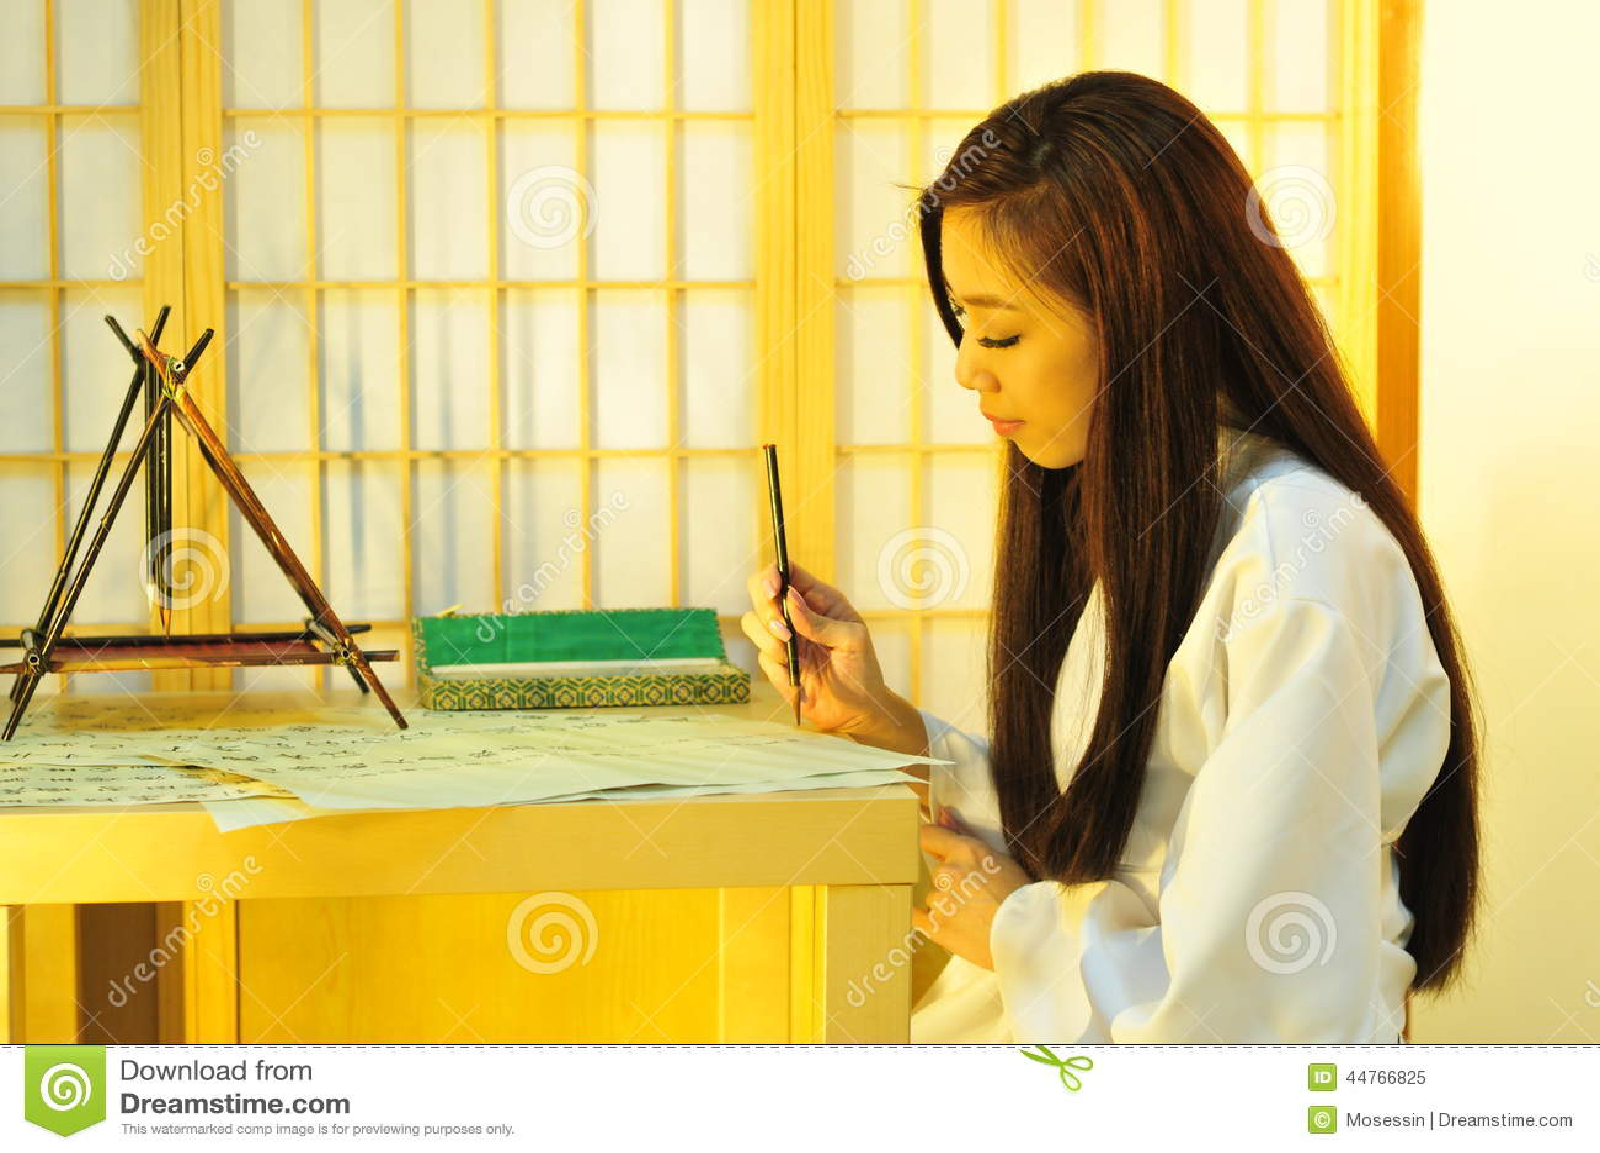 essay about geishas